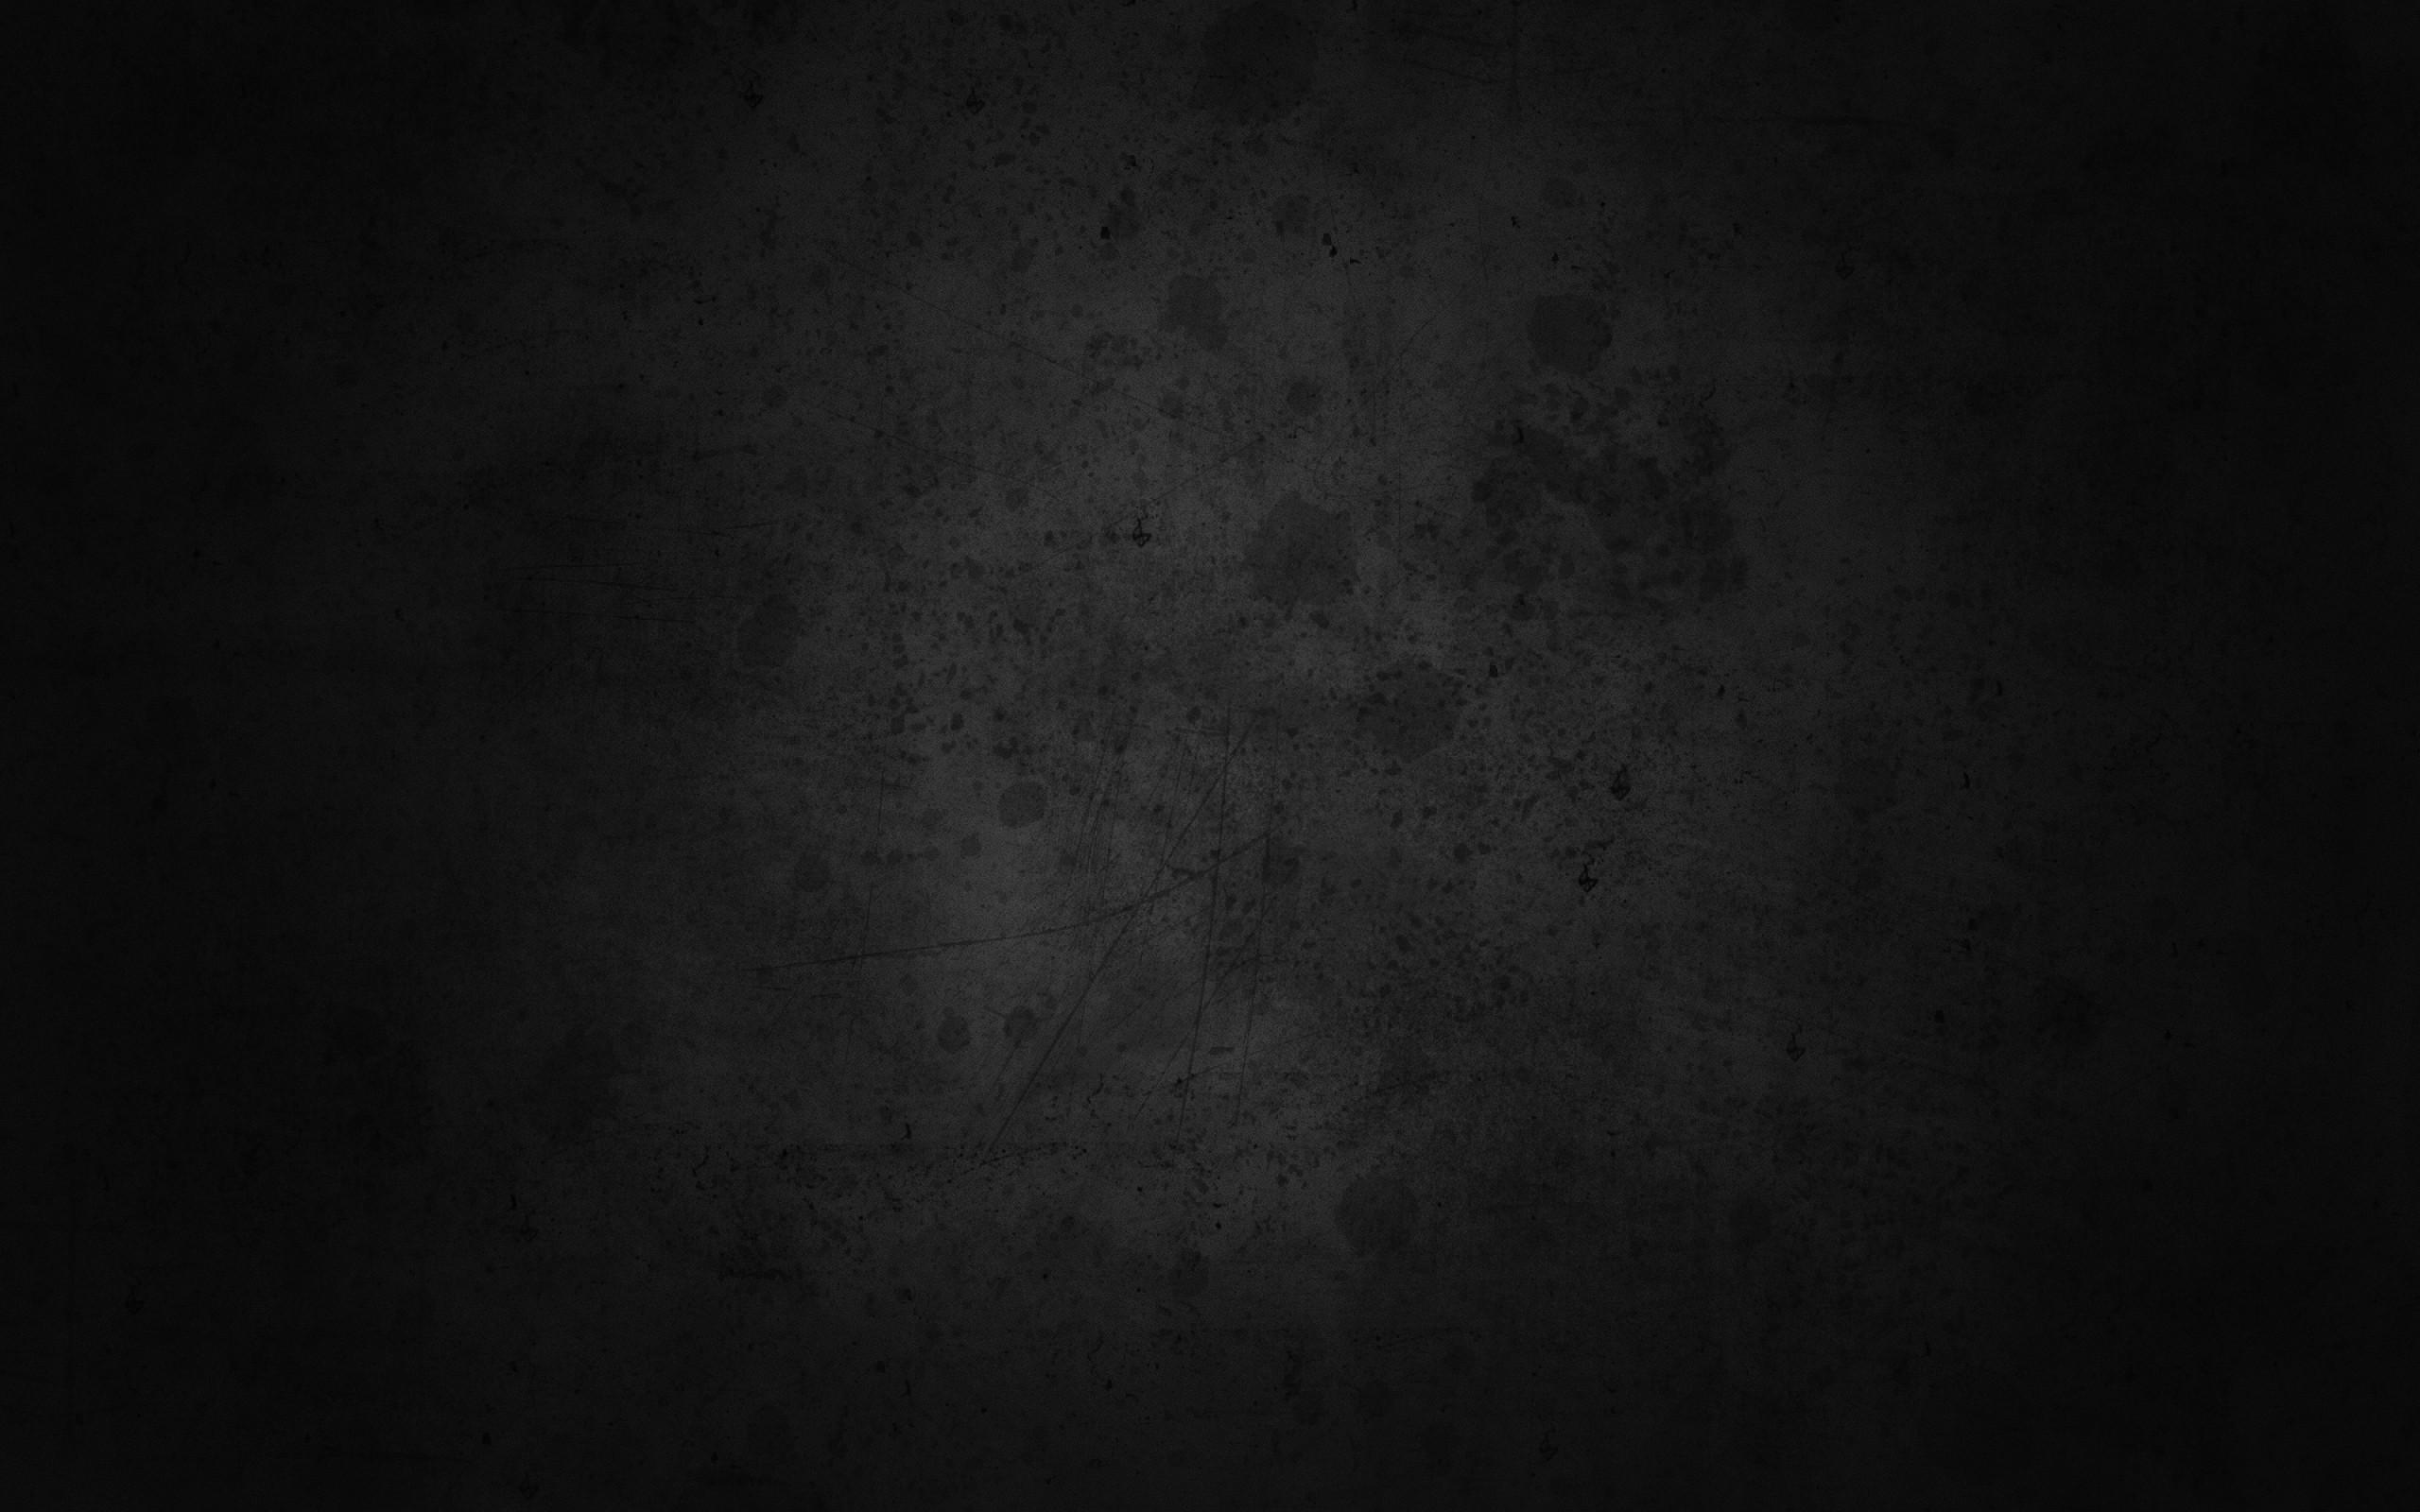 black background 1920x1200 - photo #19